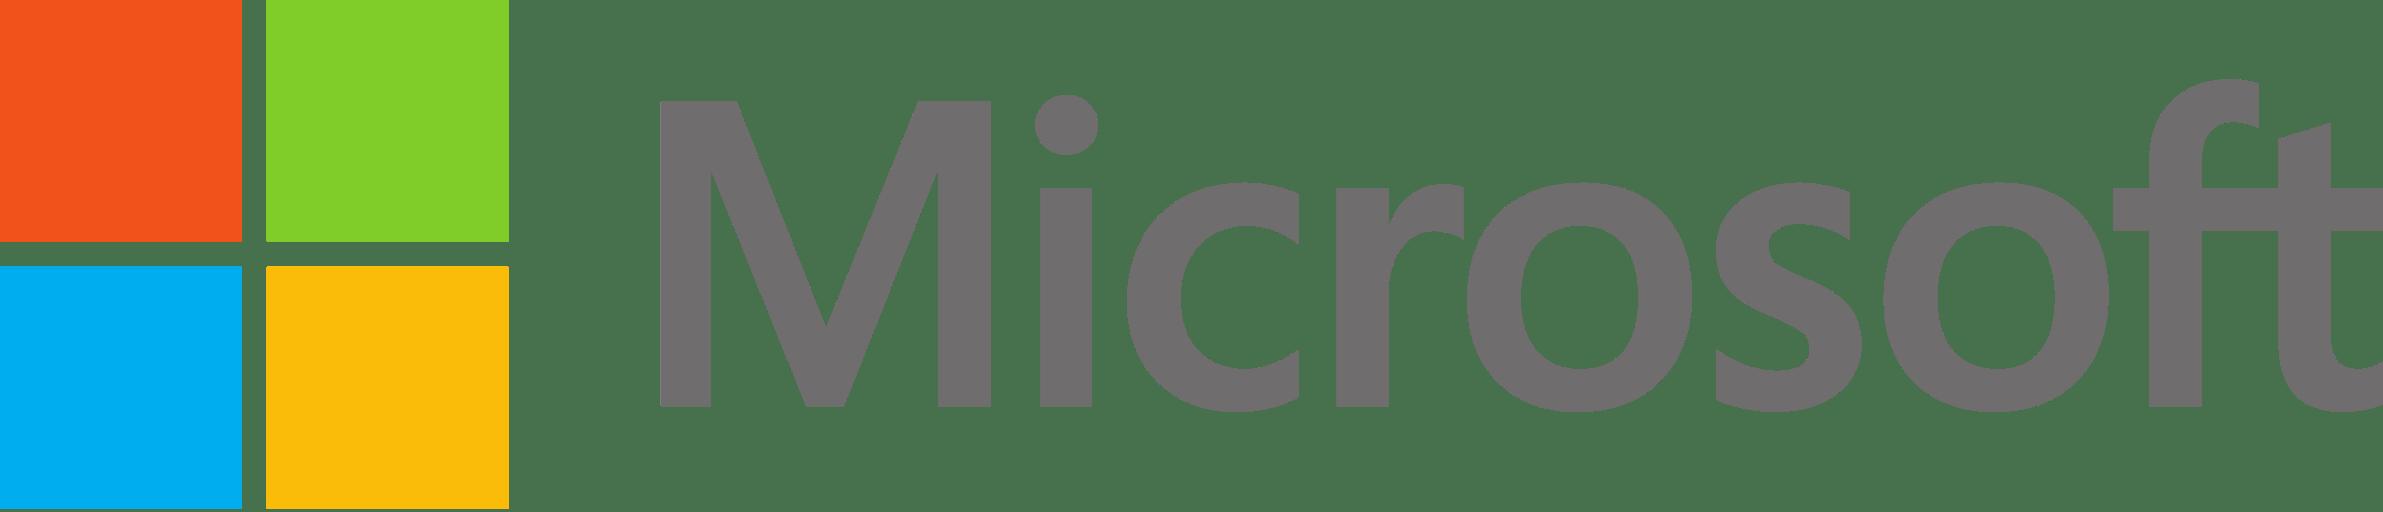 Microsoft Integration